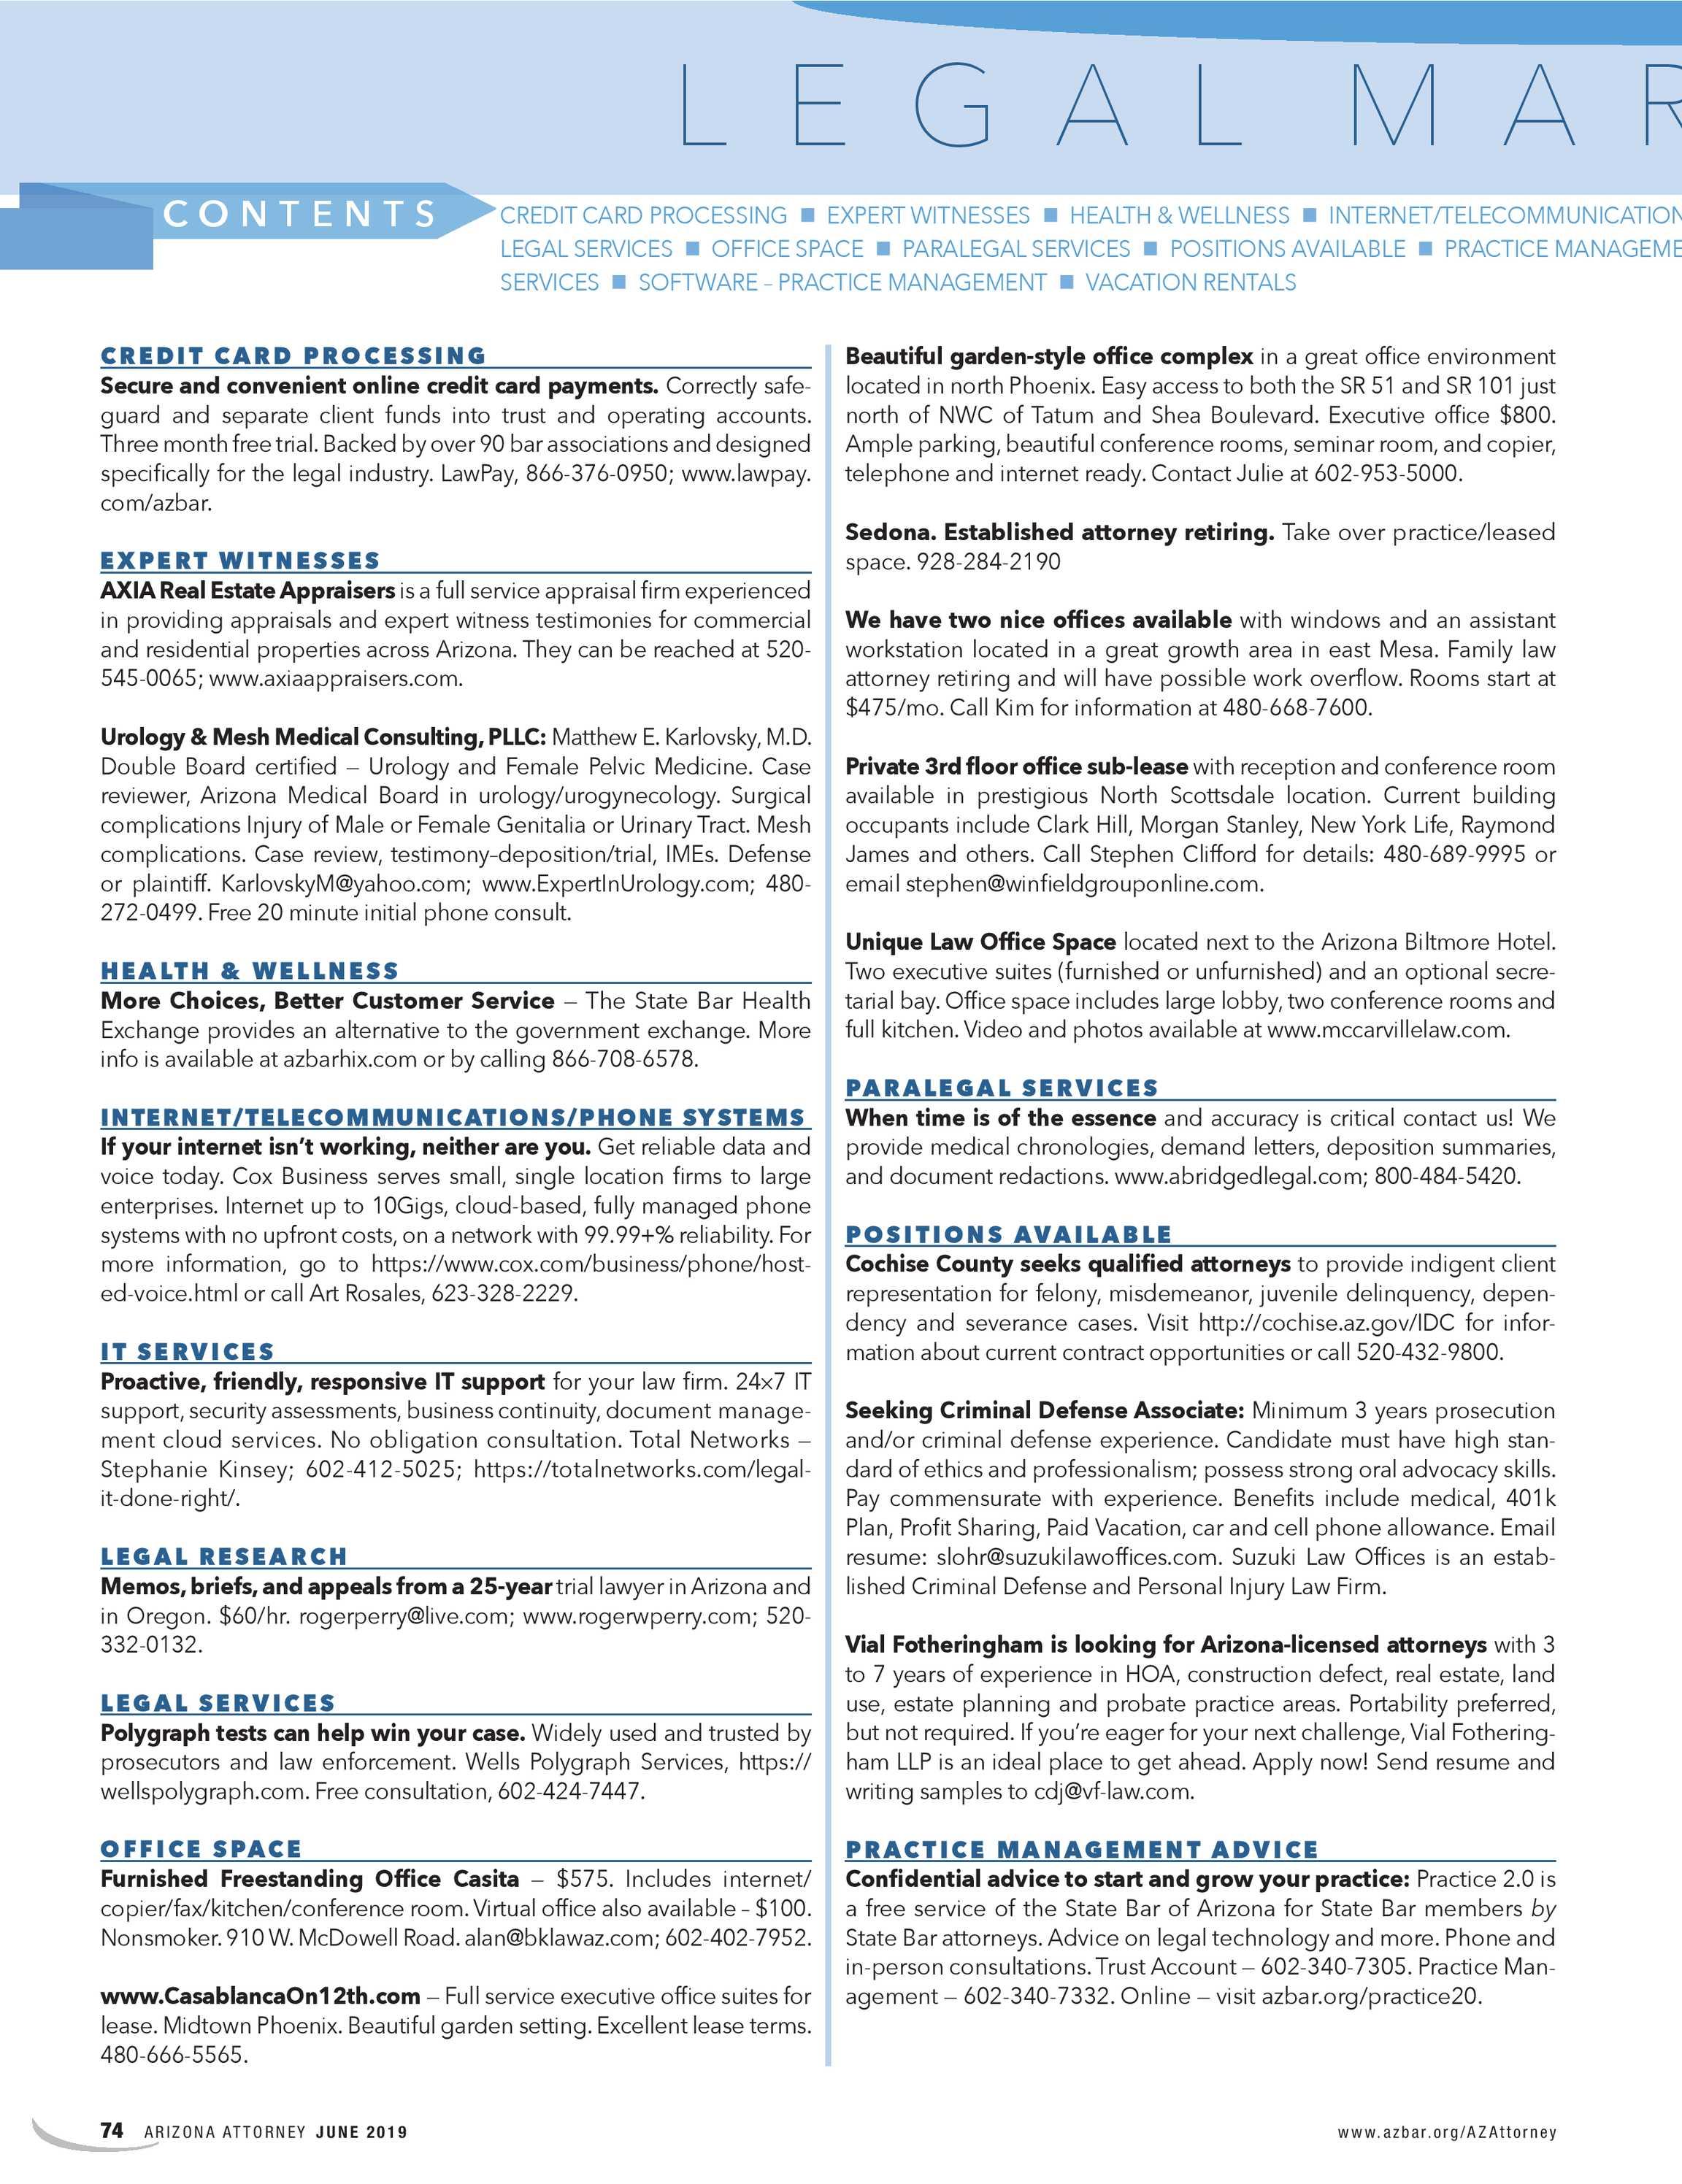 Arizona Attorney - June 2019 - page 74